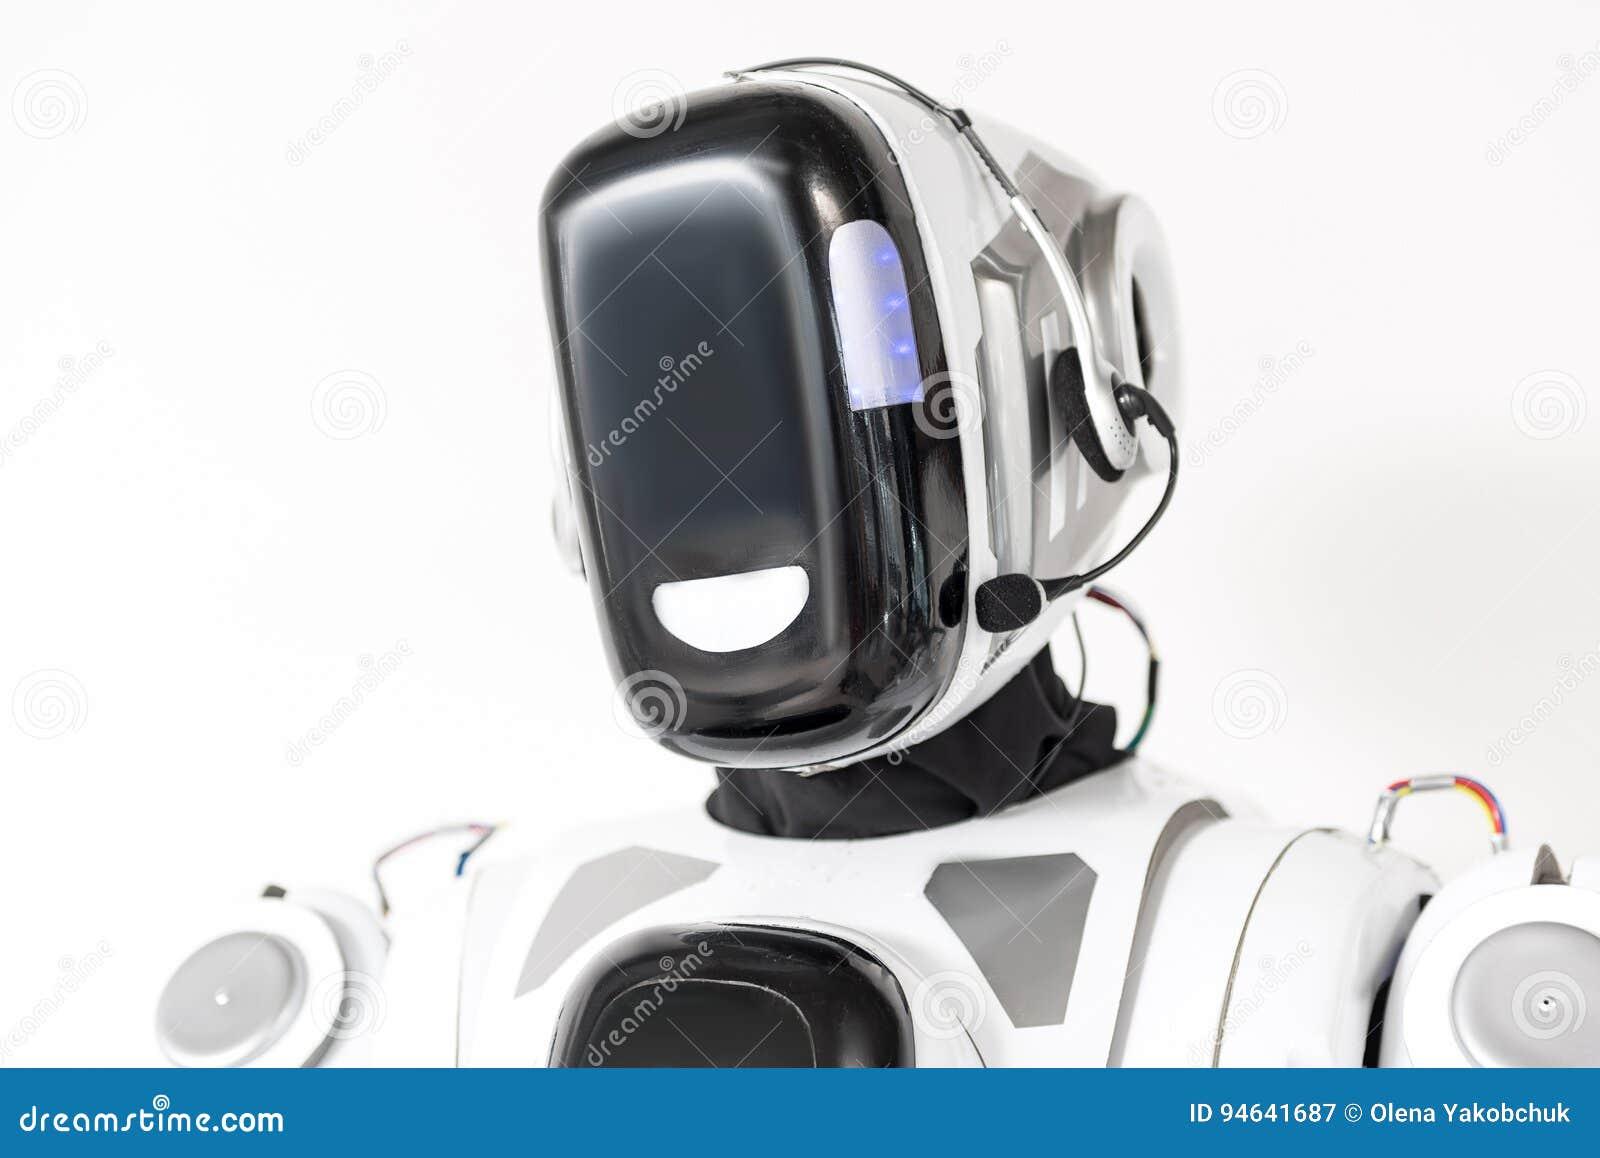 Big robot is wearing headset